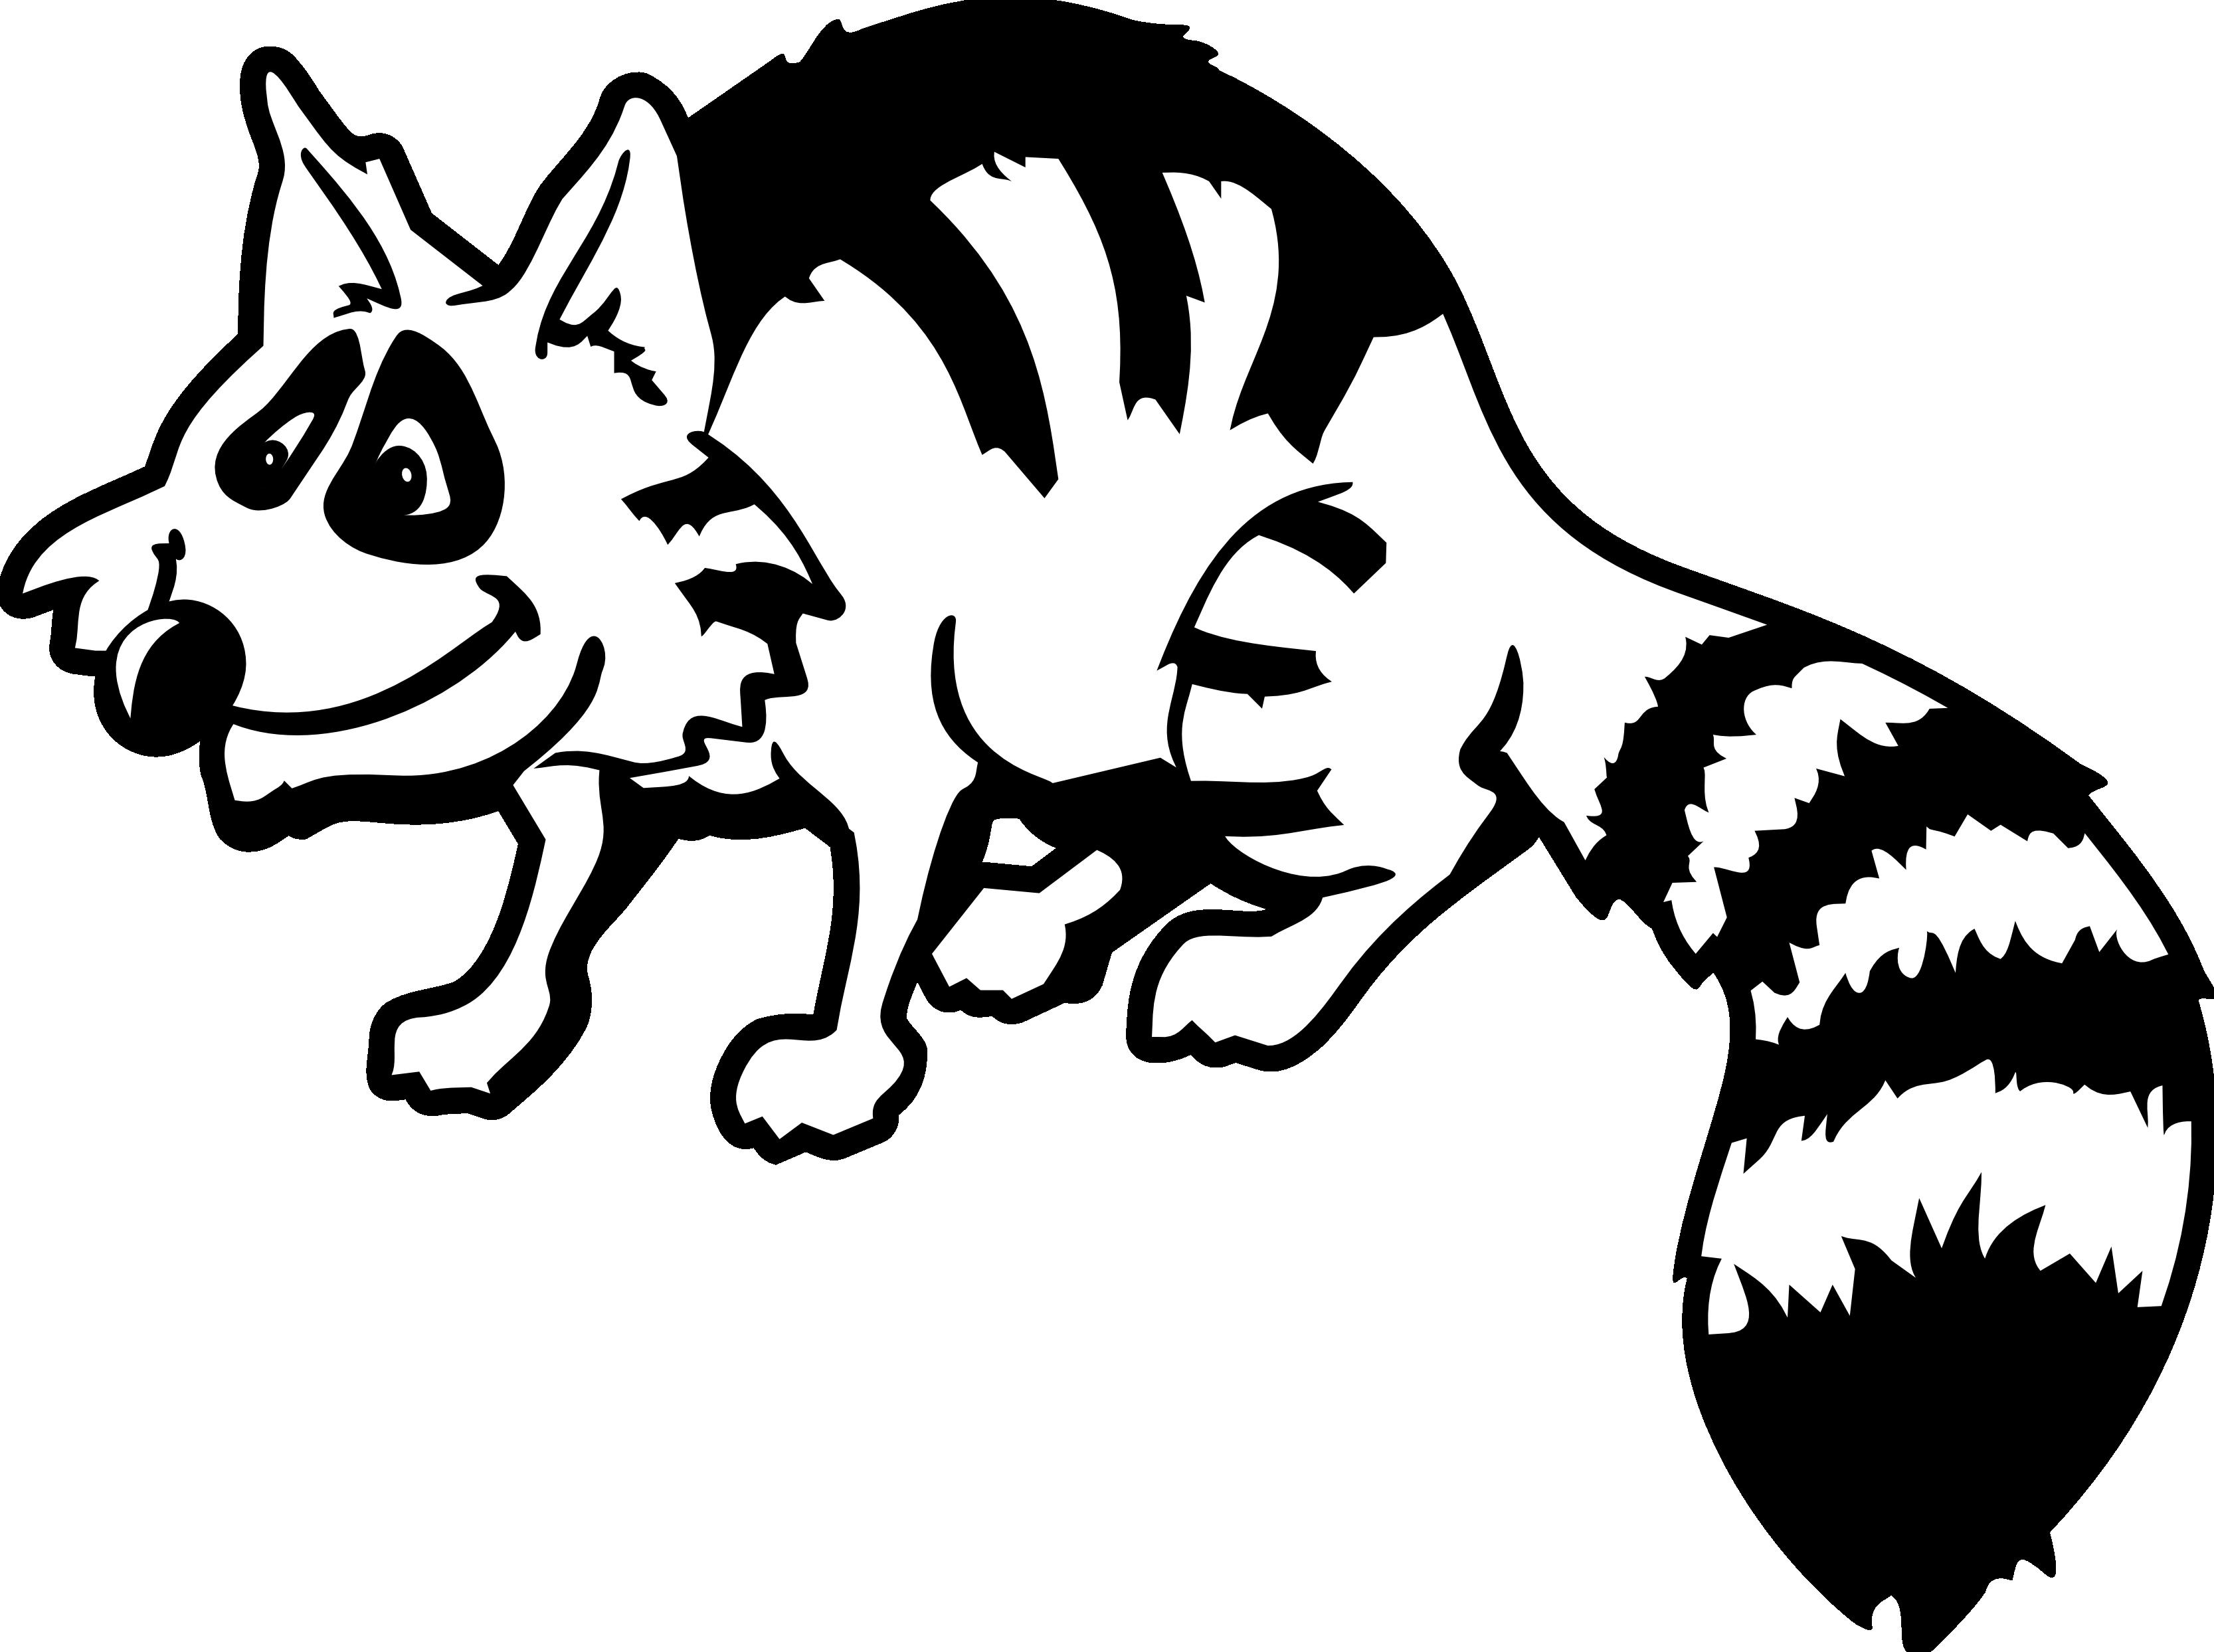 Raccoon panda free images. Racoon clipart skunk